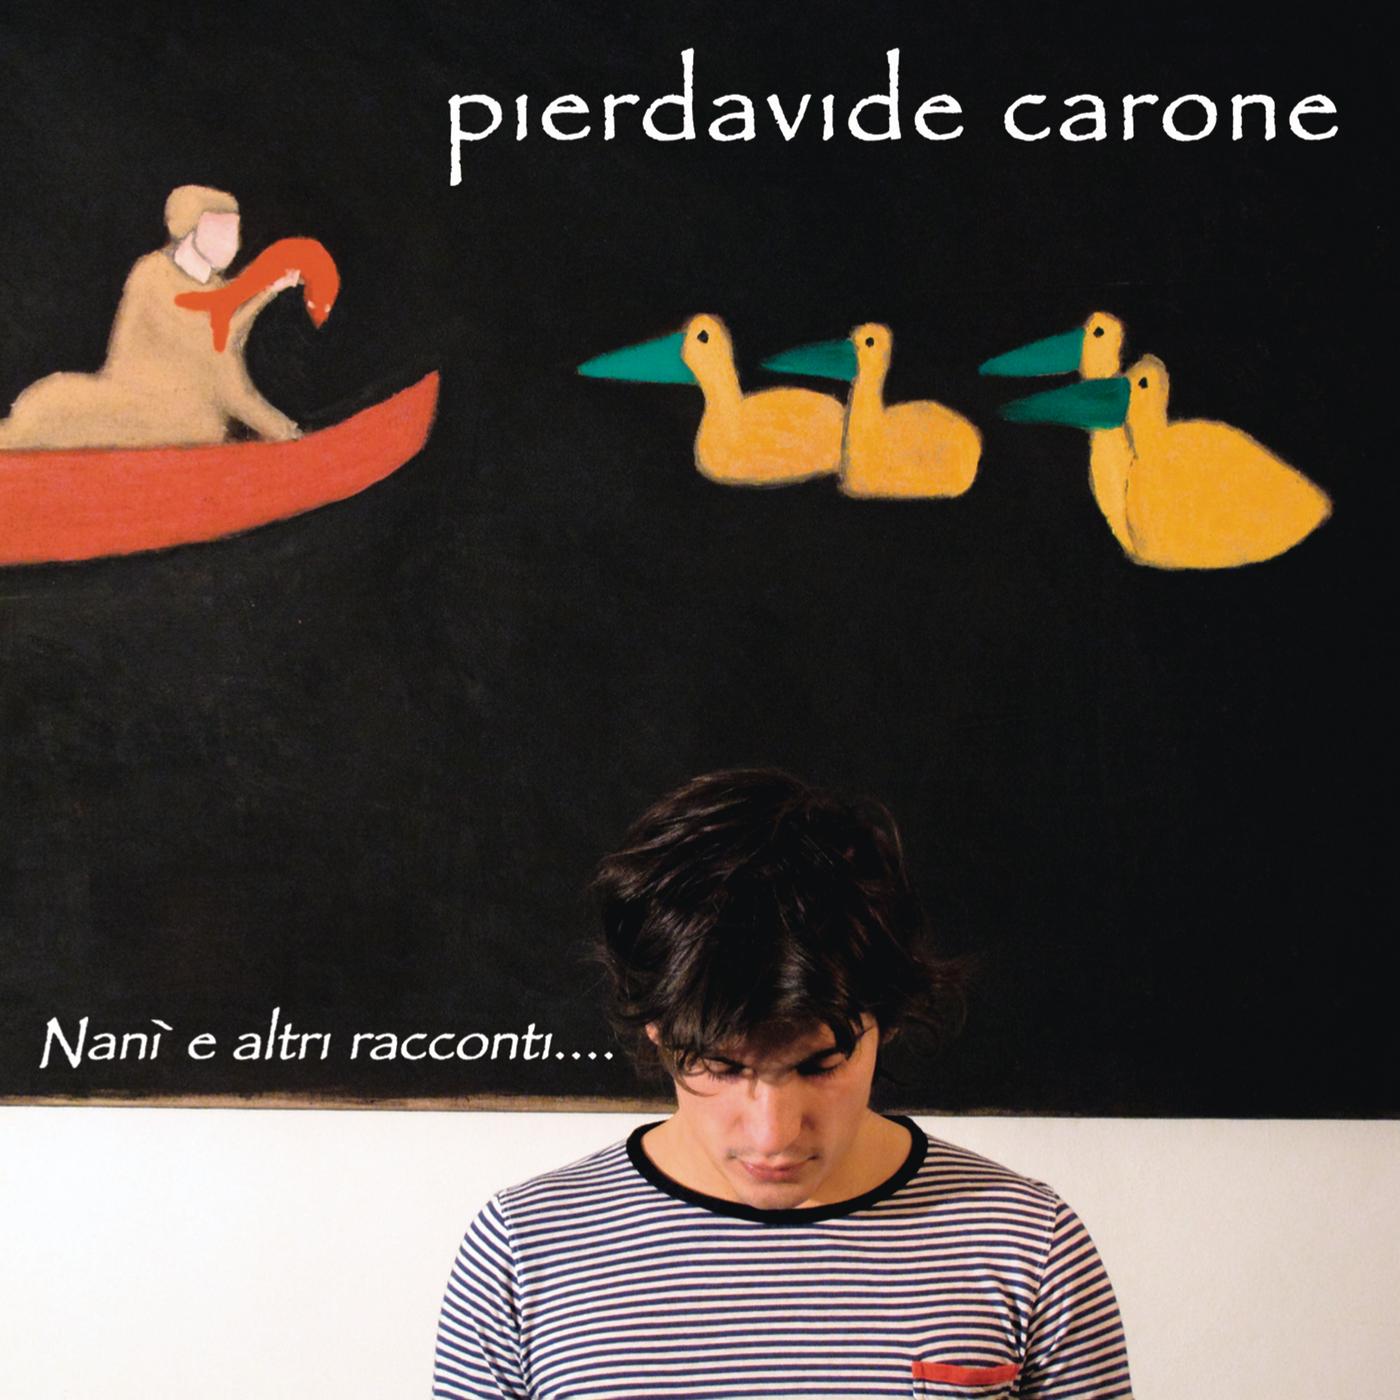 Nanì e altri racconti - Pierdavide Carone